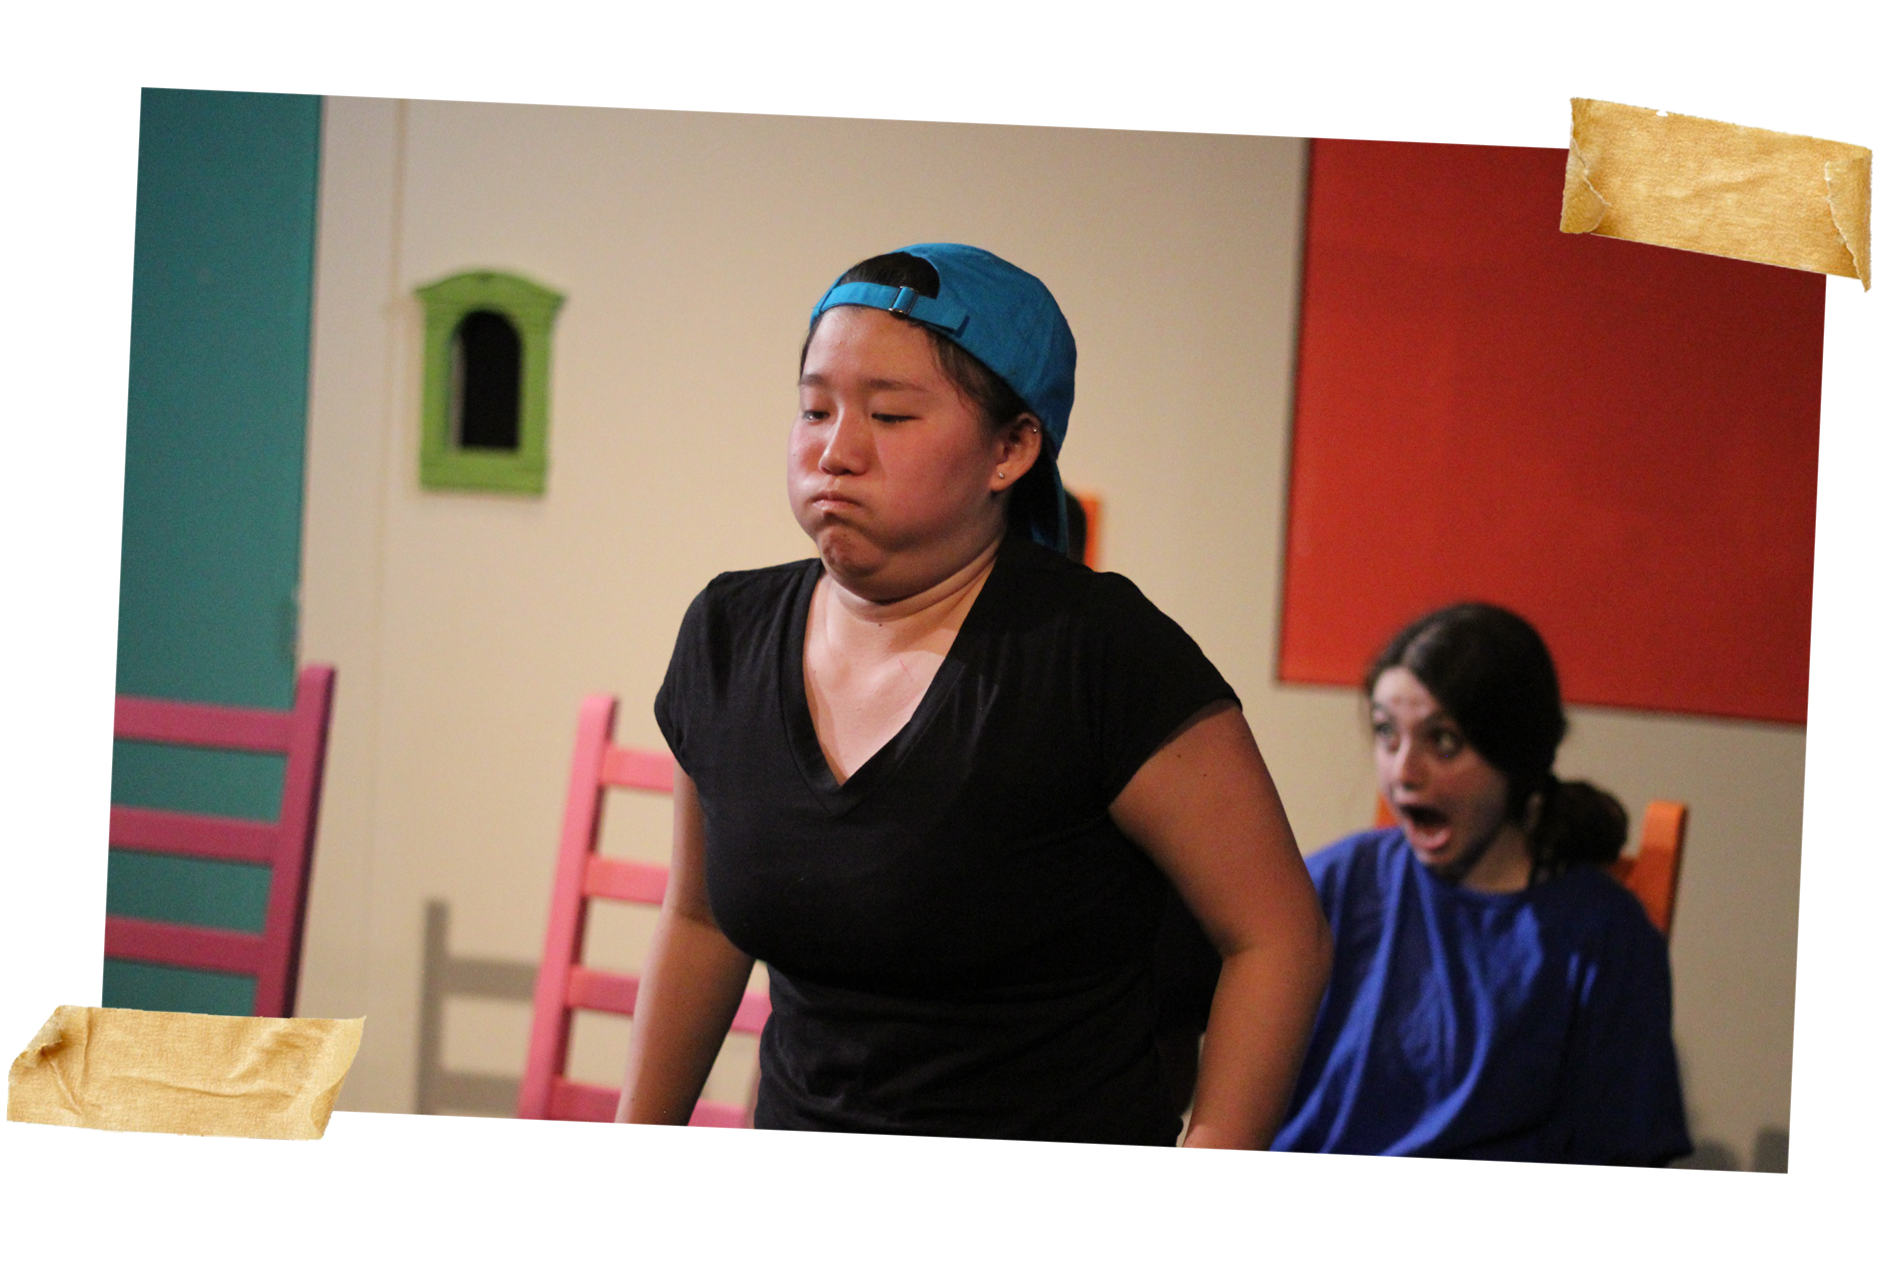 Miya as Joaquin in The Suspenders Present: Debauchery Drive (A Full Length Sketch Show)